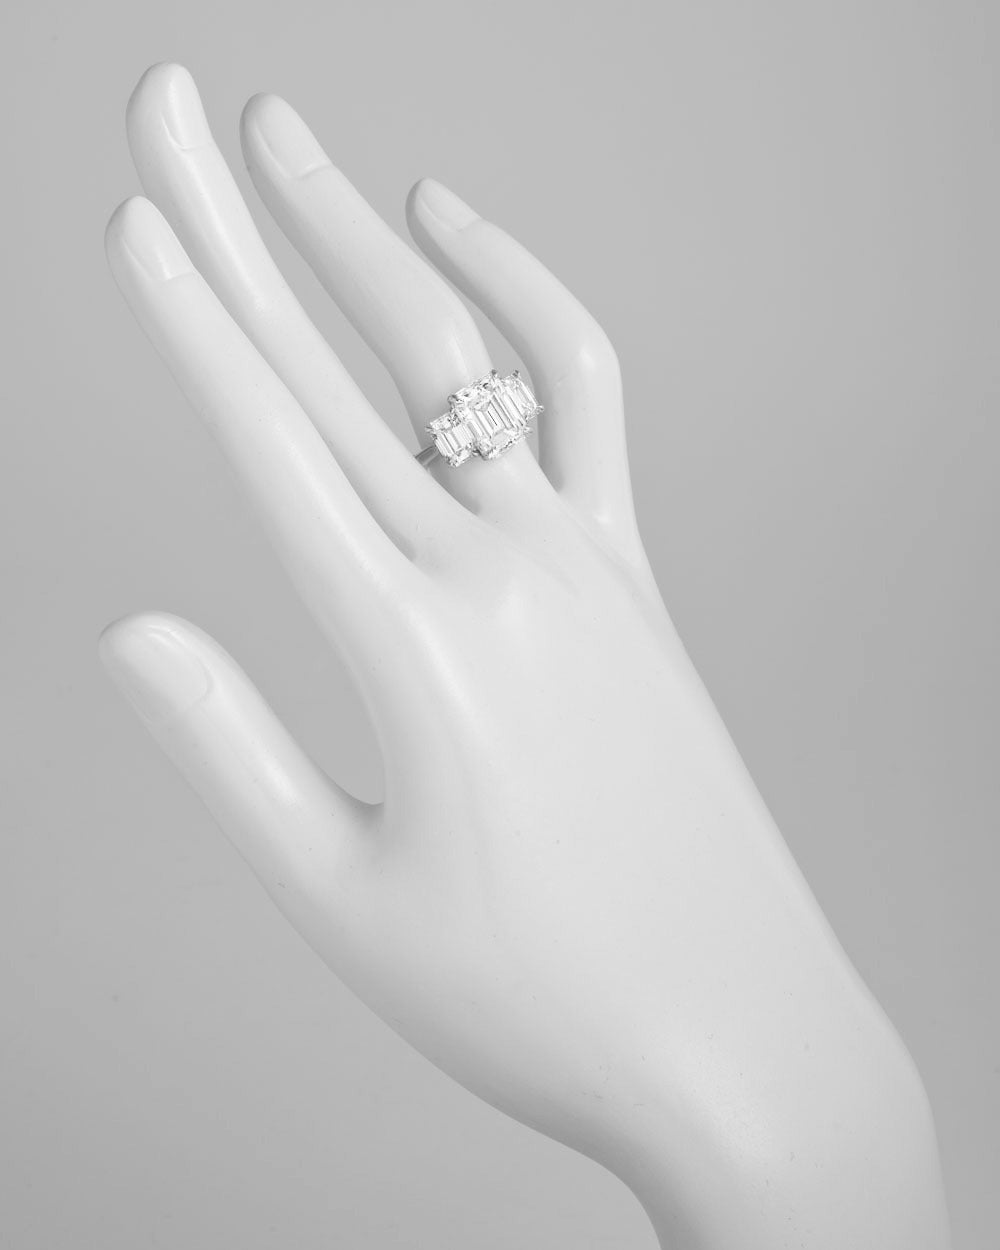 Tiffany & Co. 4.00 Carat GIA Cert Emerald-Cut Diamond Platinum Engagement Ring 2